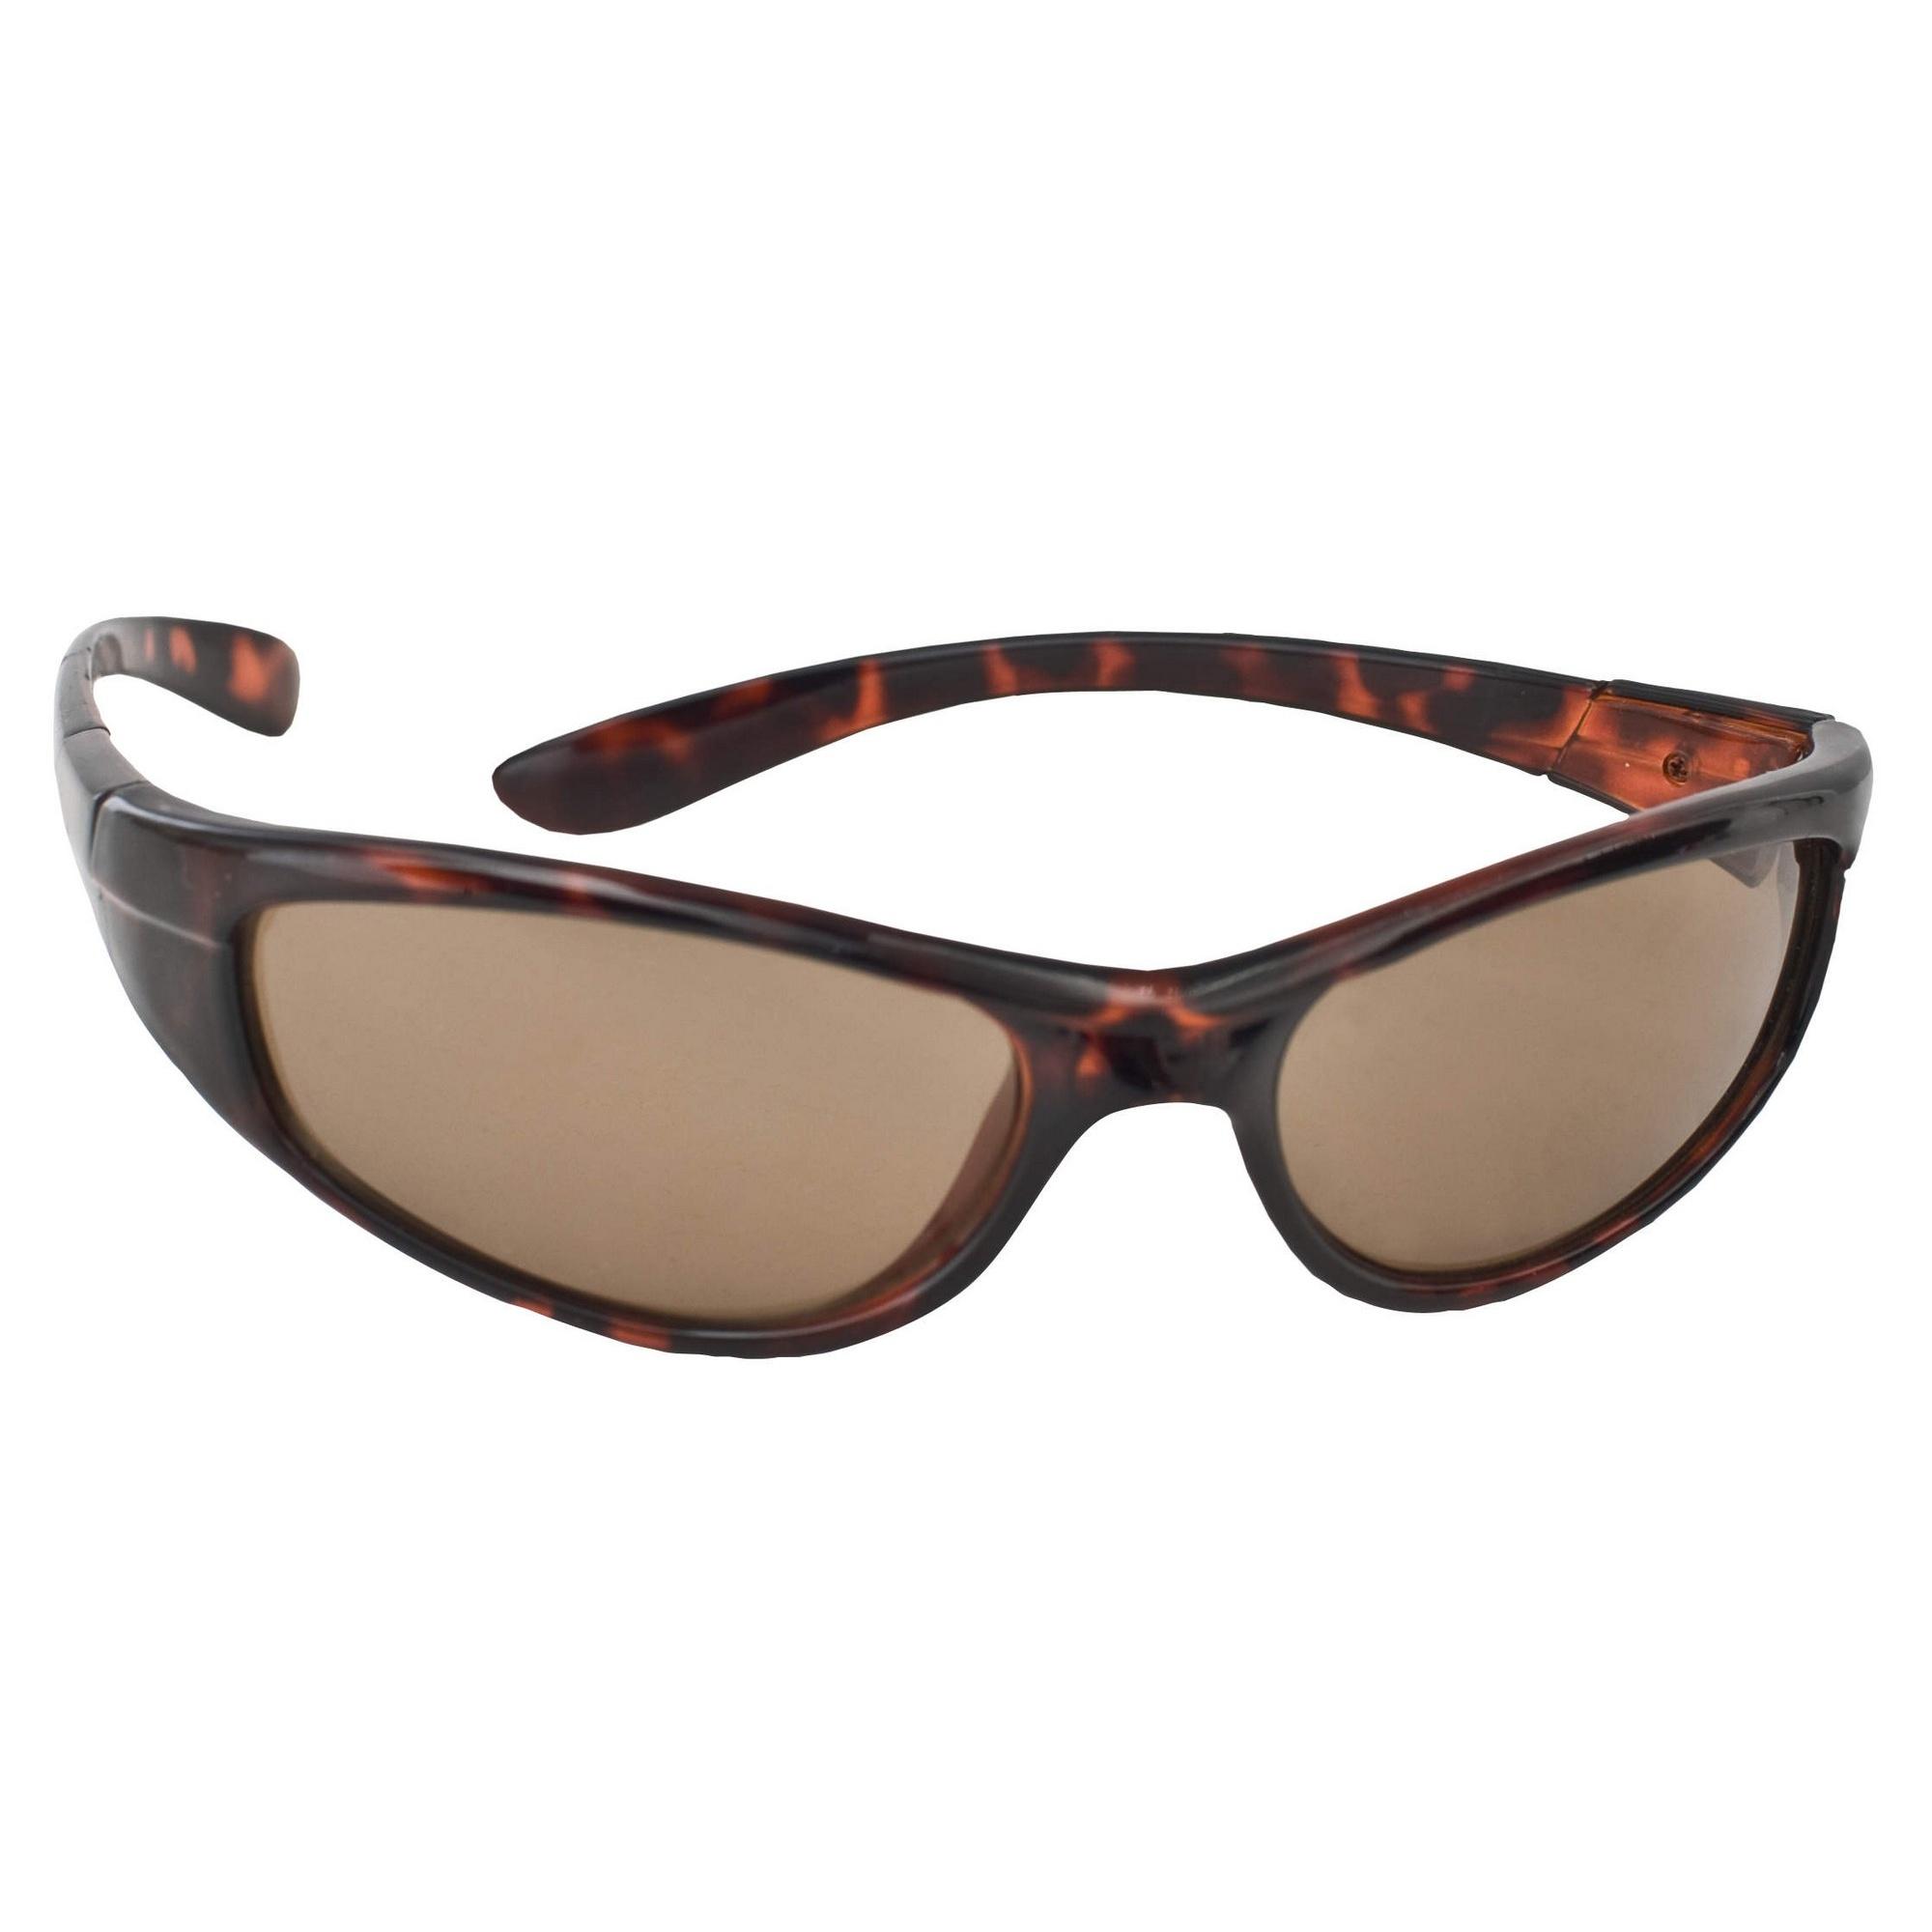 Trespass Adults Unisex Paparazzi Sunglasses TP481